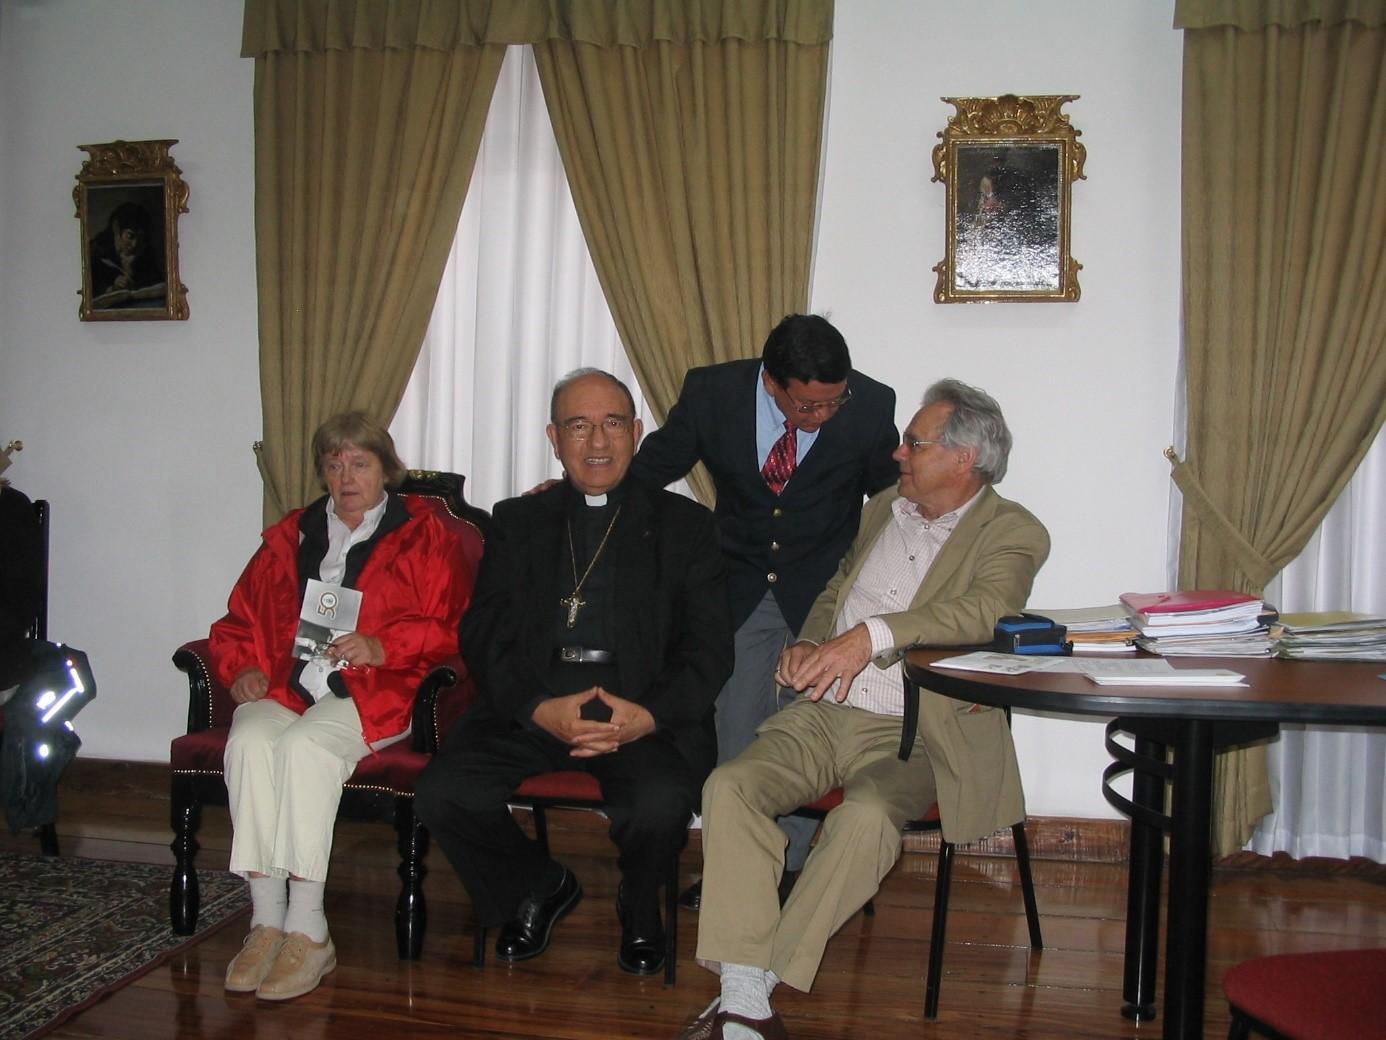 Empfang bei Kardinal Vela, Quito 2007   Von links nach rechts: Ingrid Fleißner, Kard. Raul Vela, Alberto Solorzano, Dr. Karl Fleißner